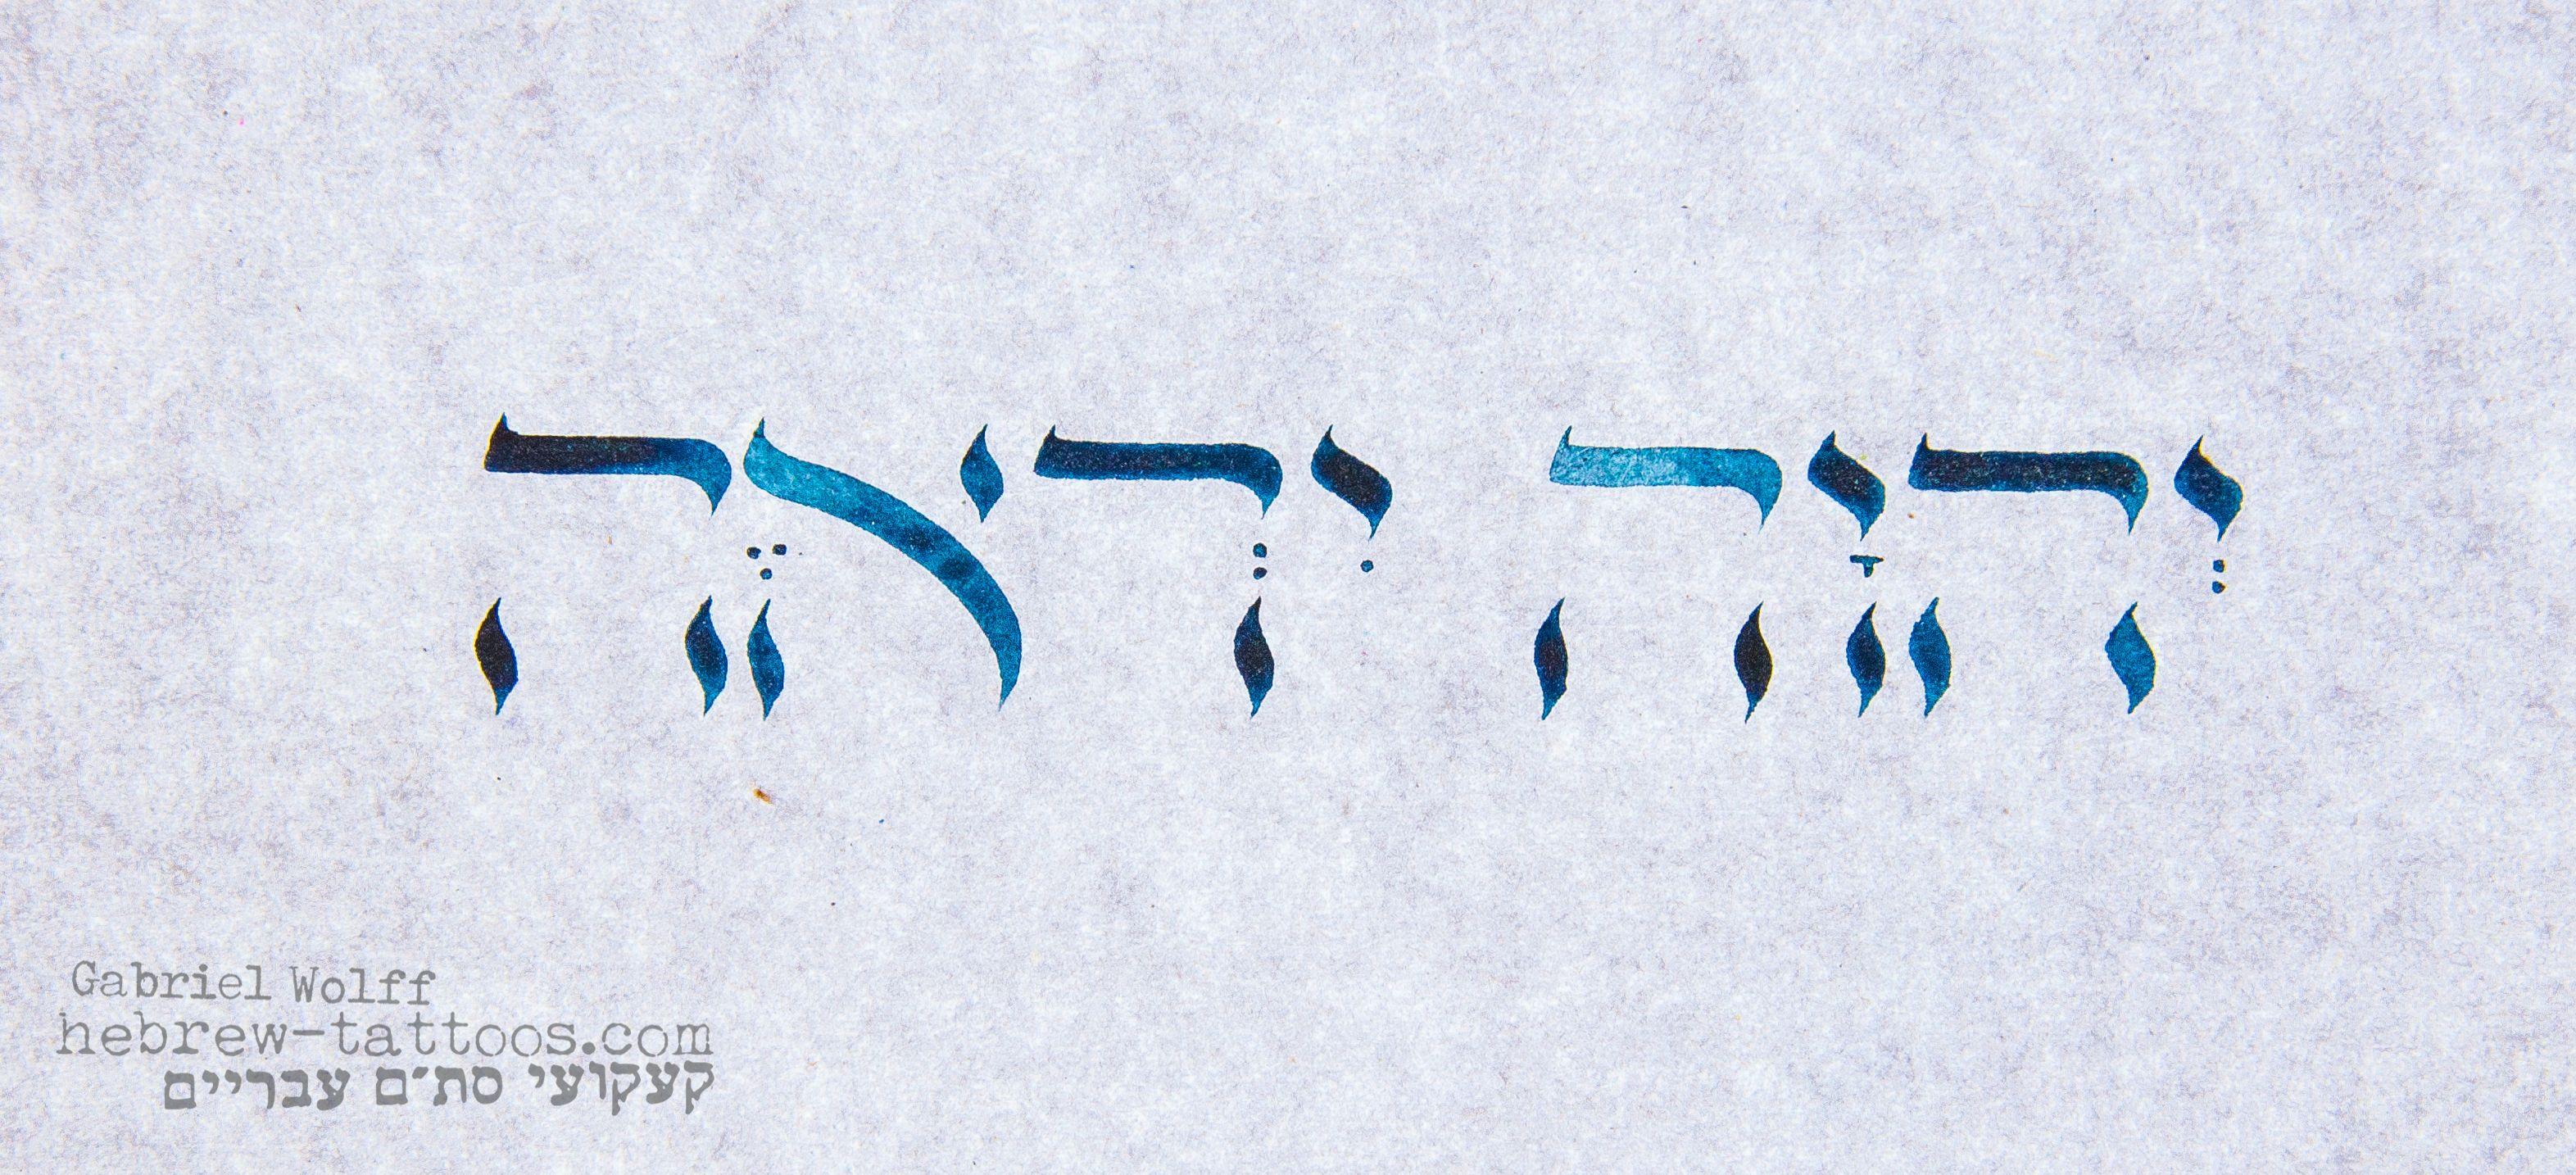 A hebrew tattoo design of jesus my savior scriptures a hebrew tattoo design of jesus my savior scriptures pinterest hebrew tattoos tattoo designs and tattoo biocorpaavc Image collections